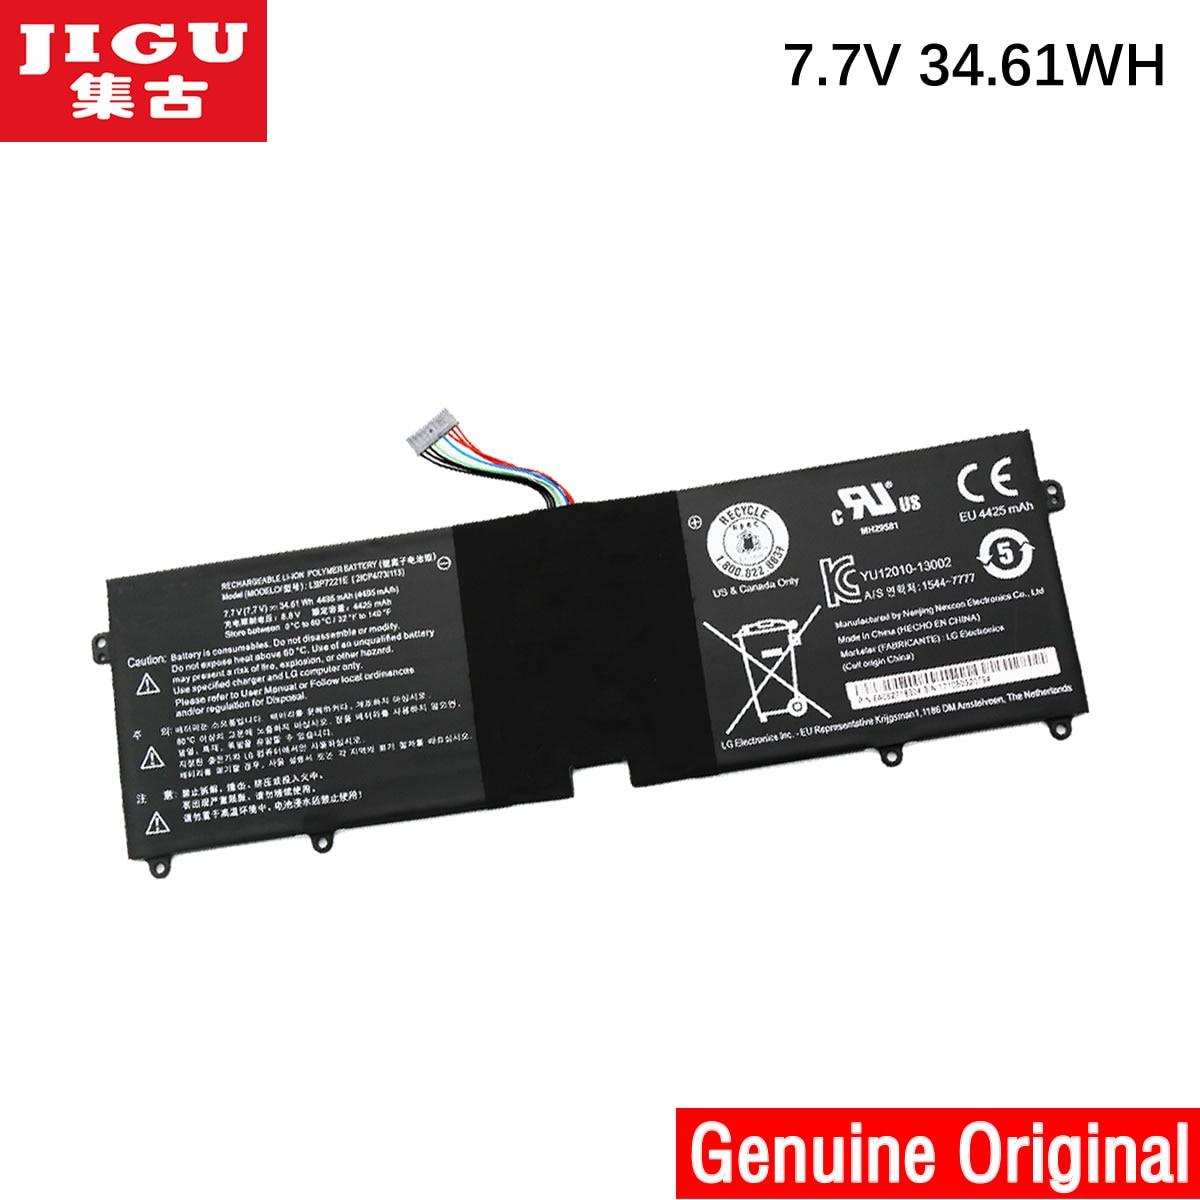 Batería Original para ordenador portátil JIGU LBG722VH EAC62718301 para LG para Gram 15Z950-GT5GK 13Z940-LT1PK 15ZD950-LX10K